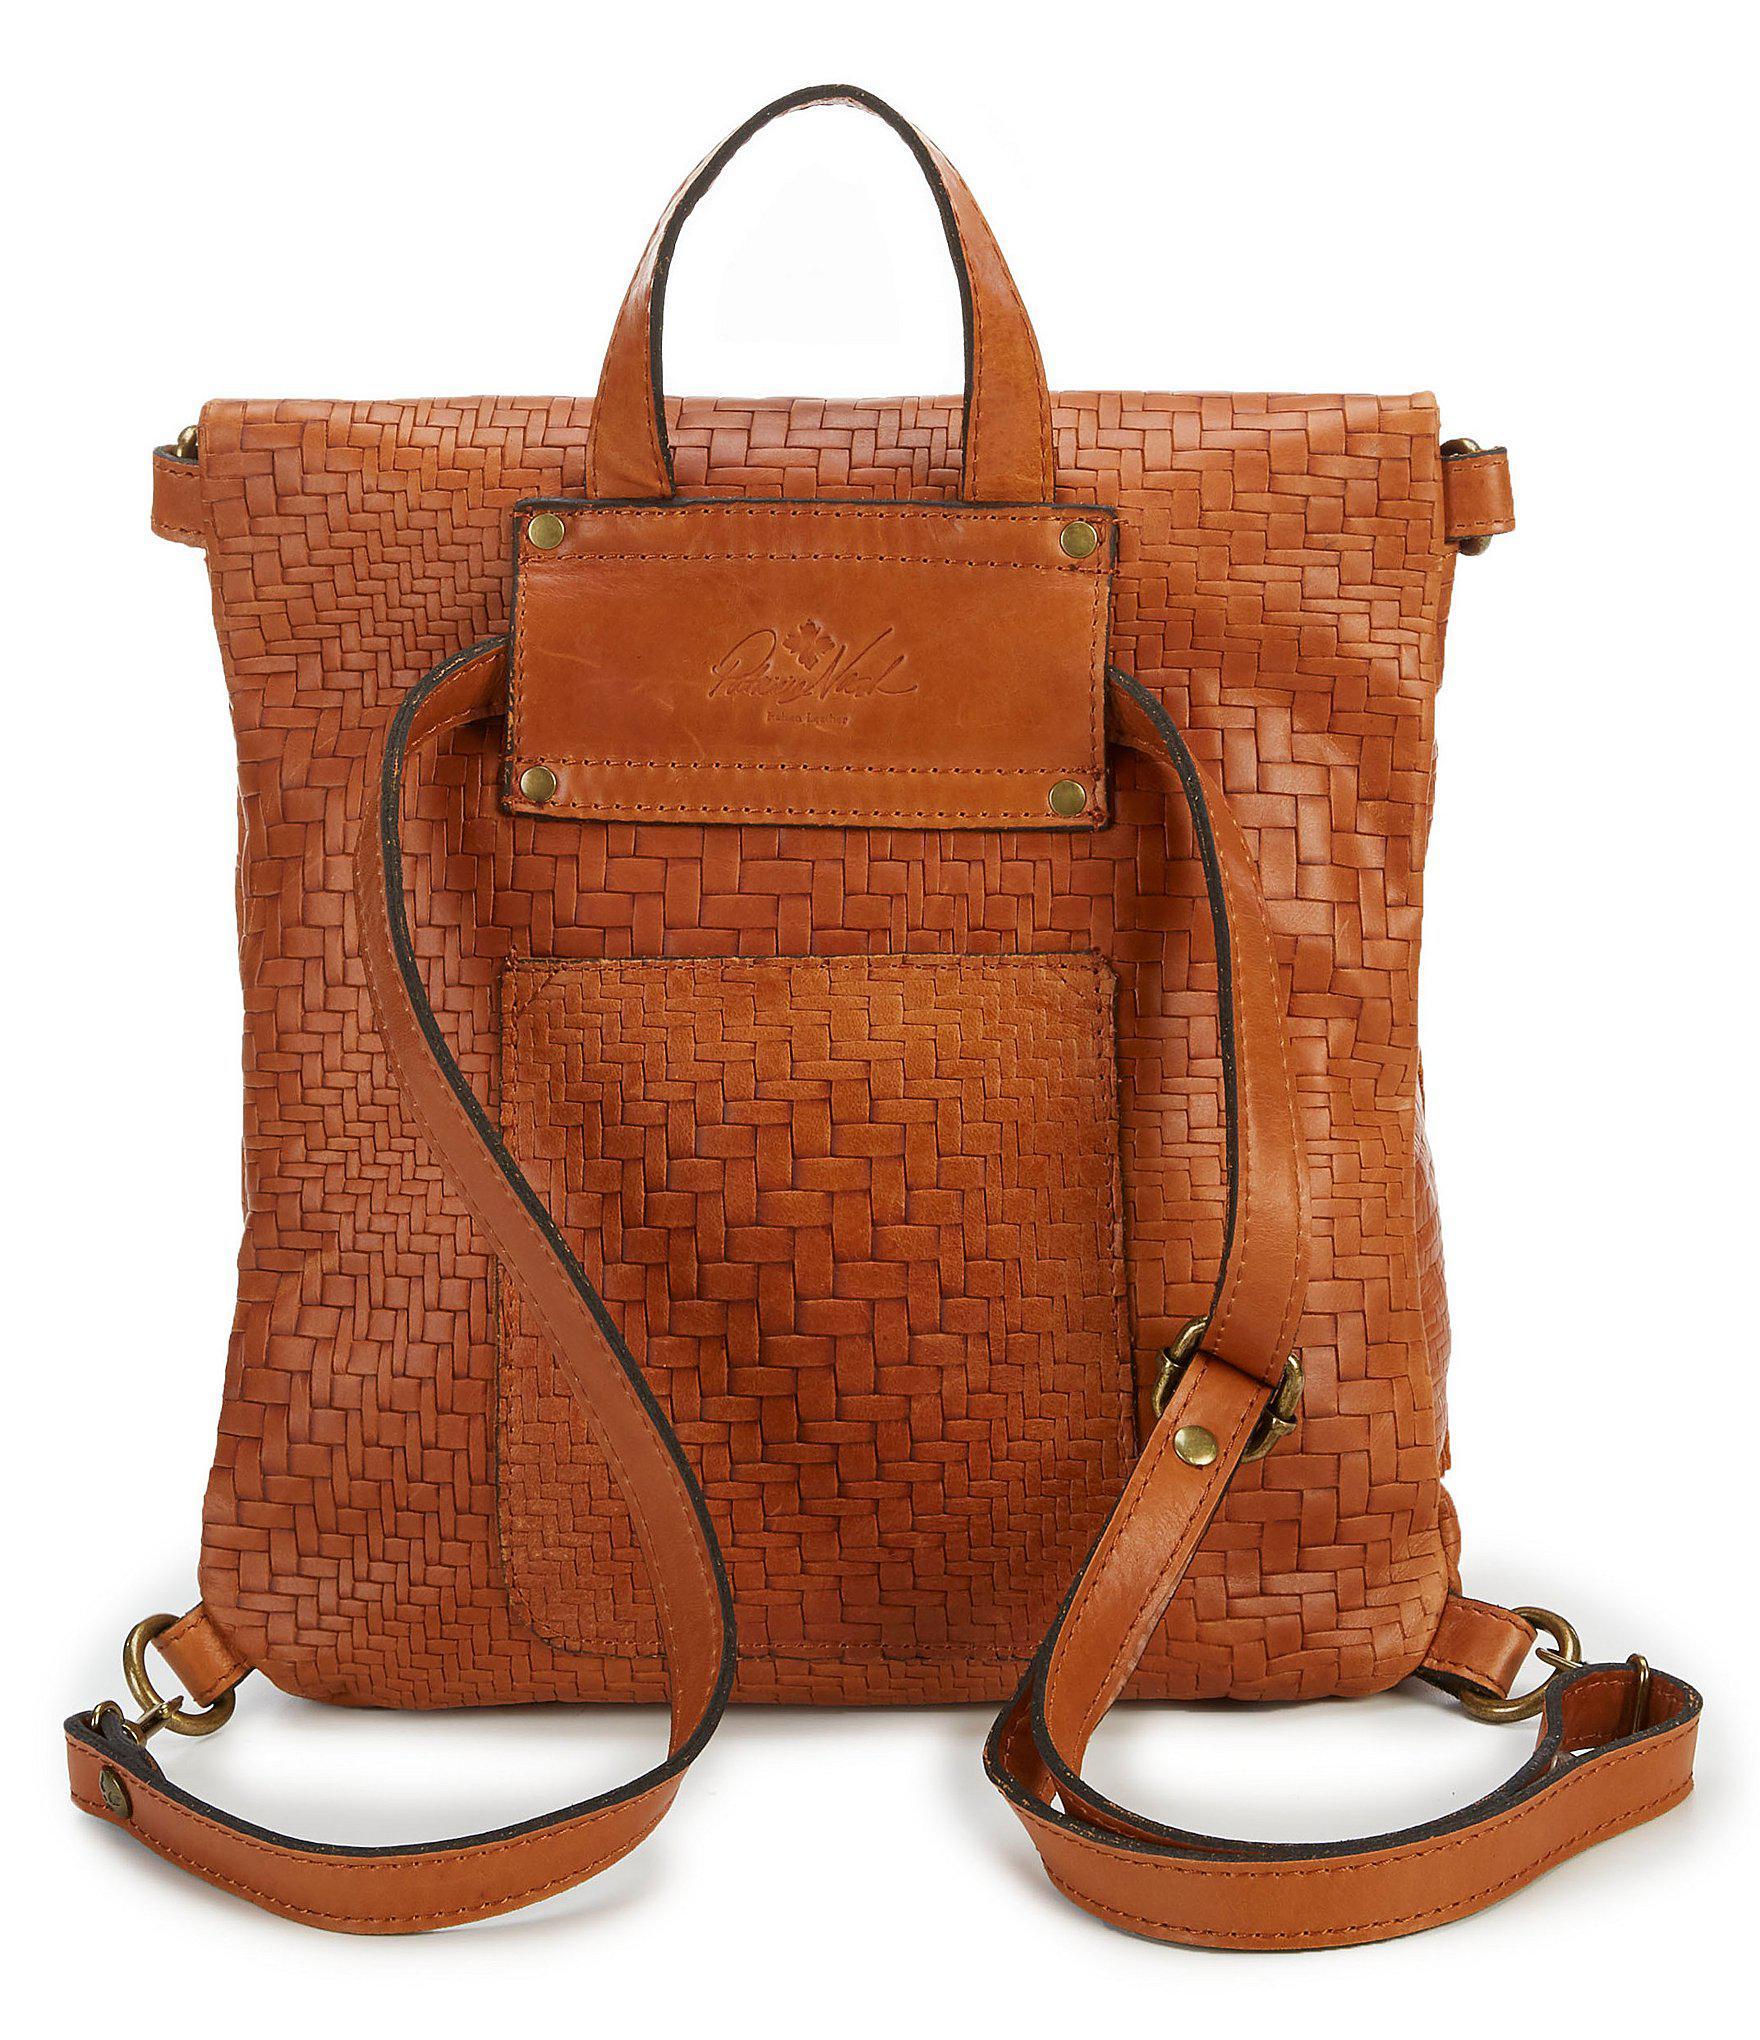 00b14542b5c Women's Brown Luzille Tasseled Woven Convertible Backpack